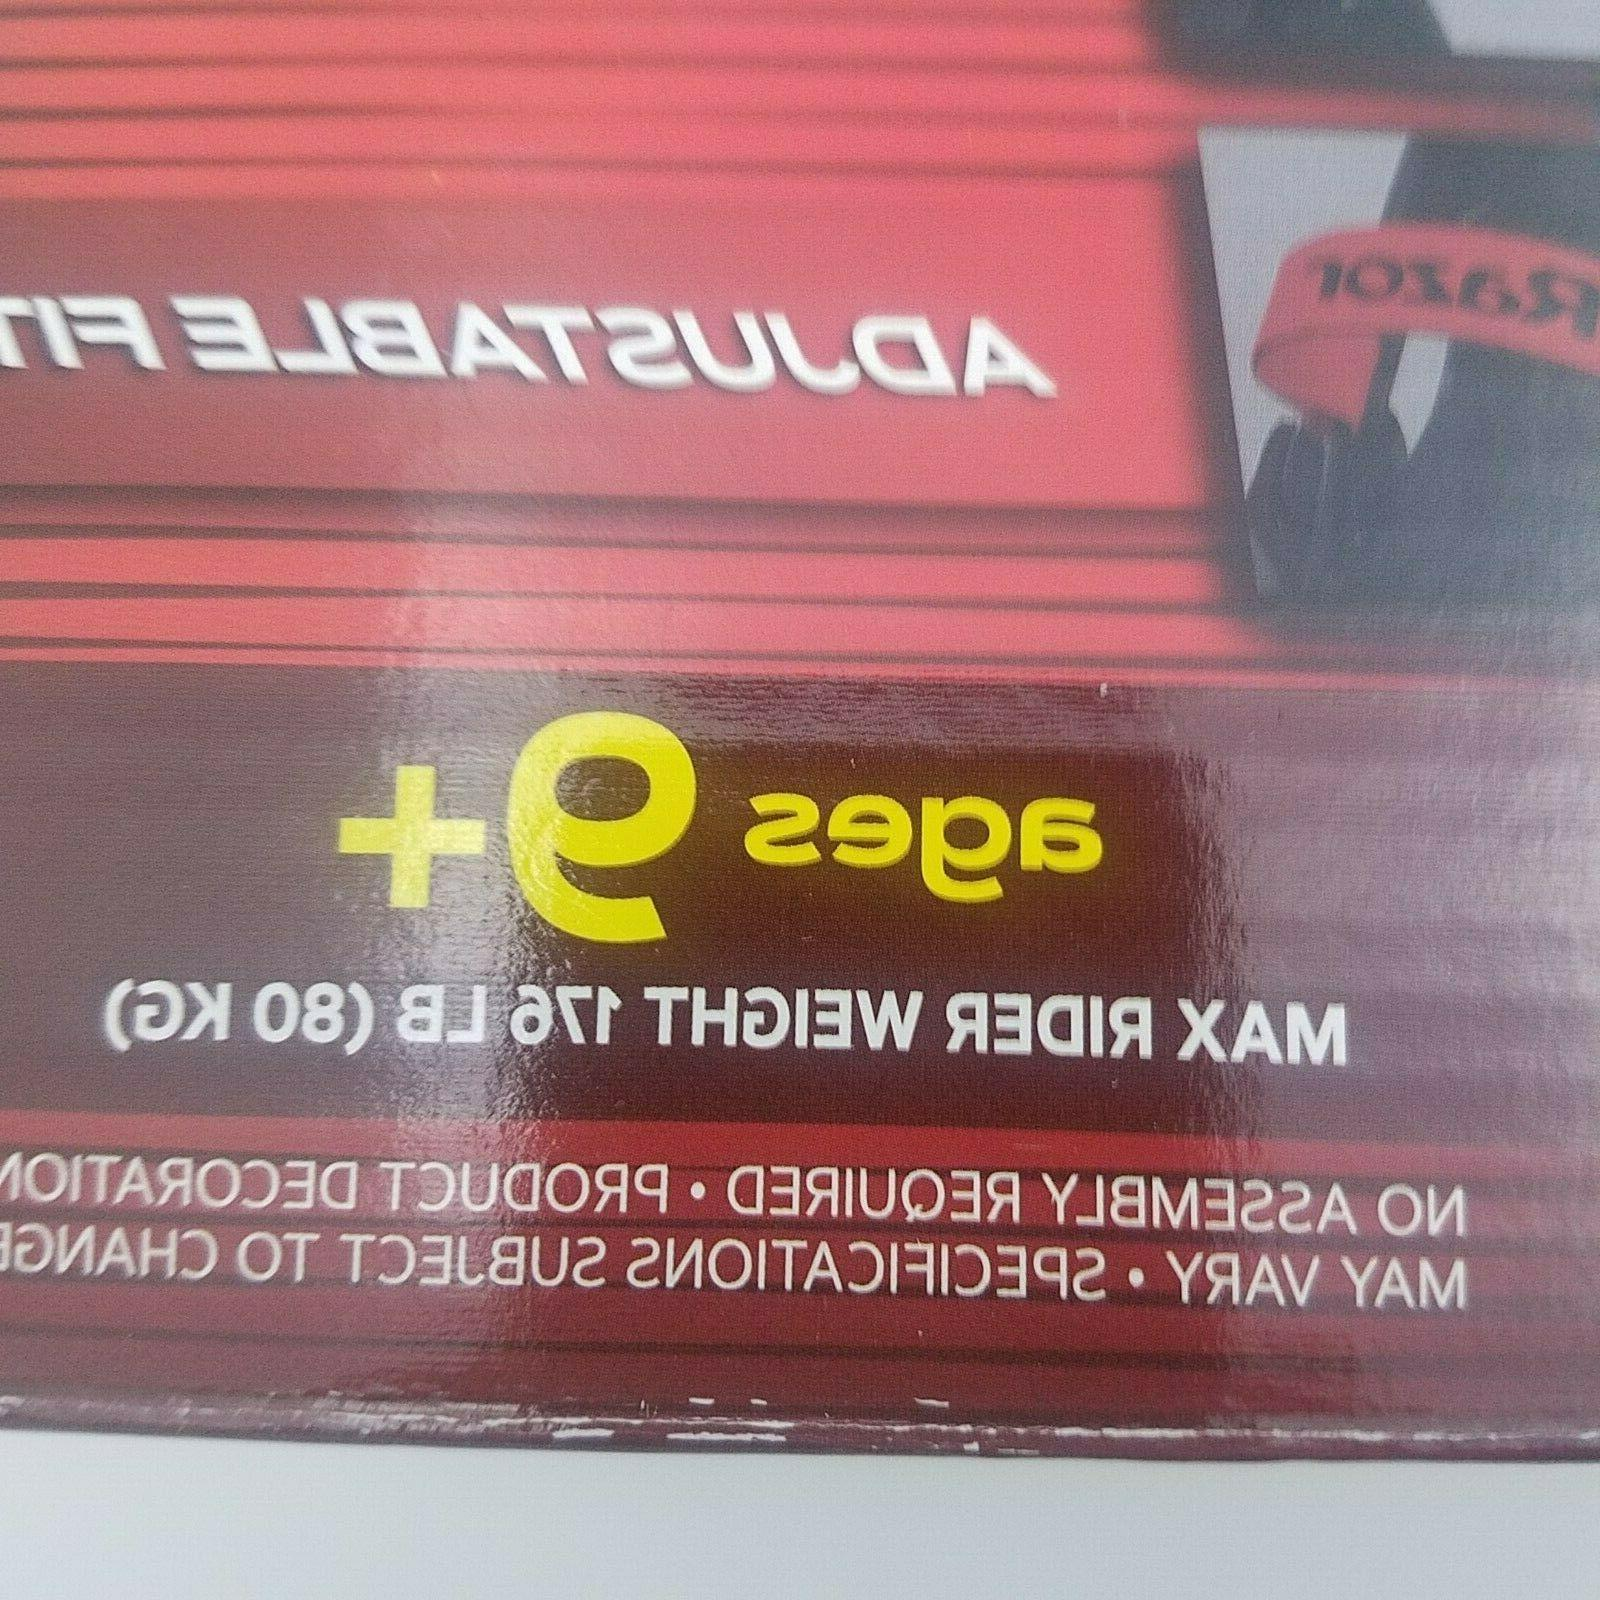 Razor Turbo Jetts Heel Skates Battery